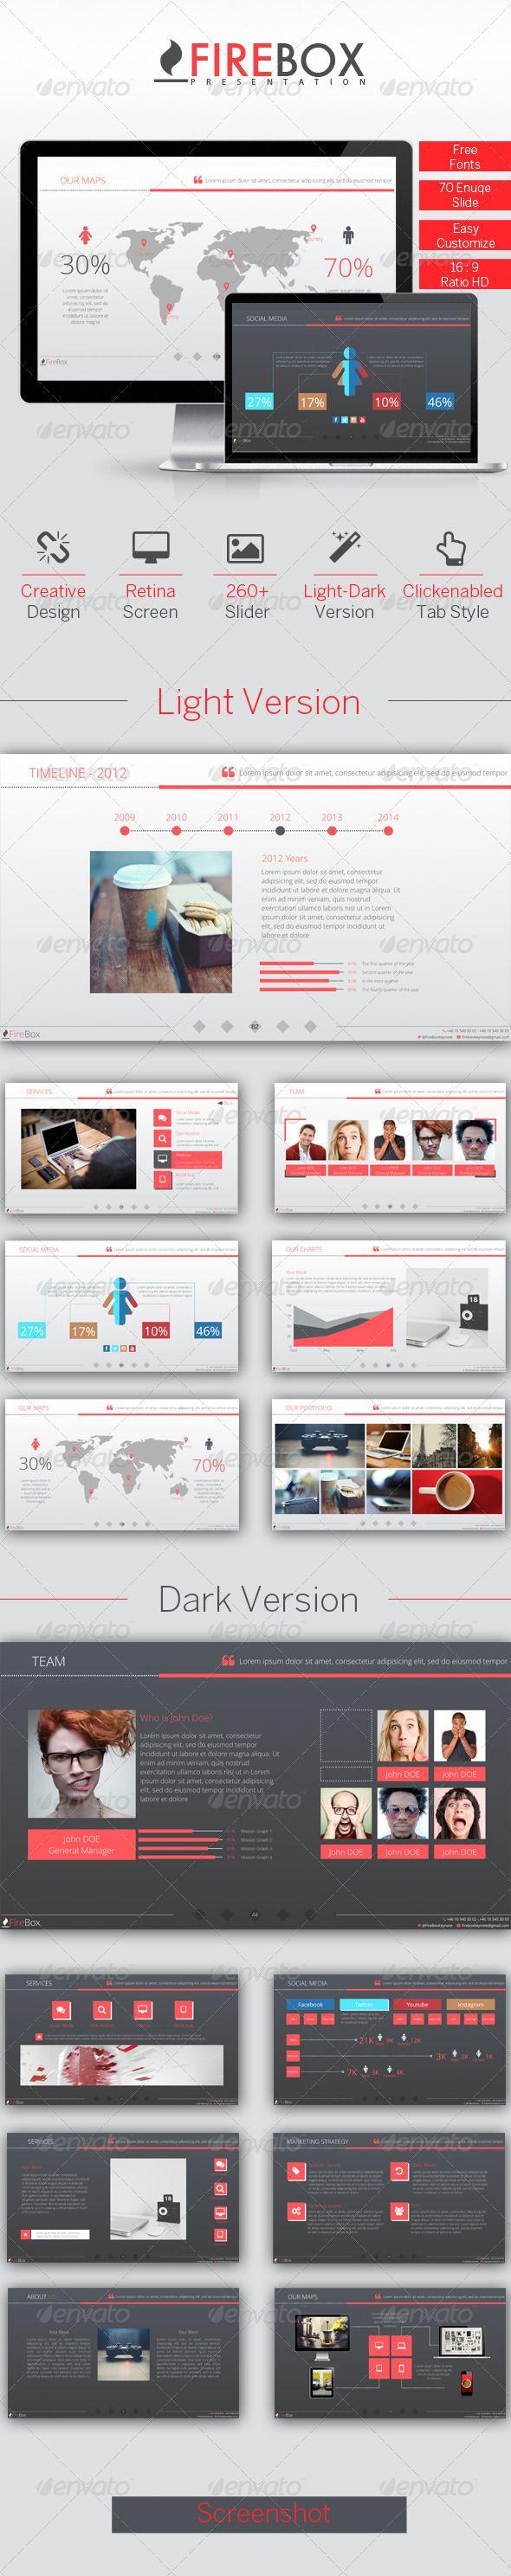 FireBox Creative PowerPoint Presentation